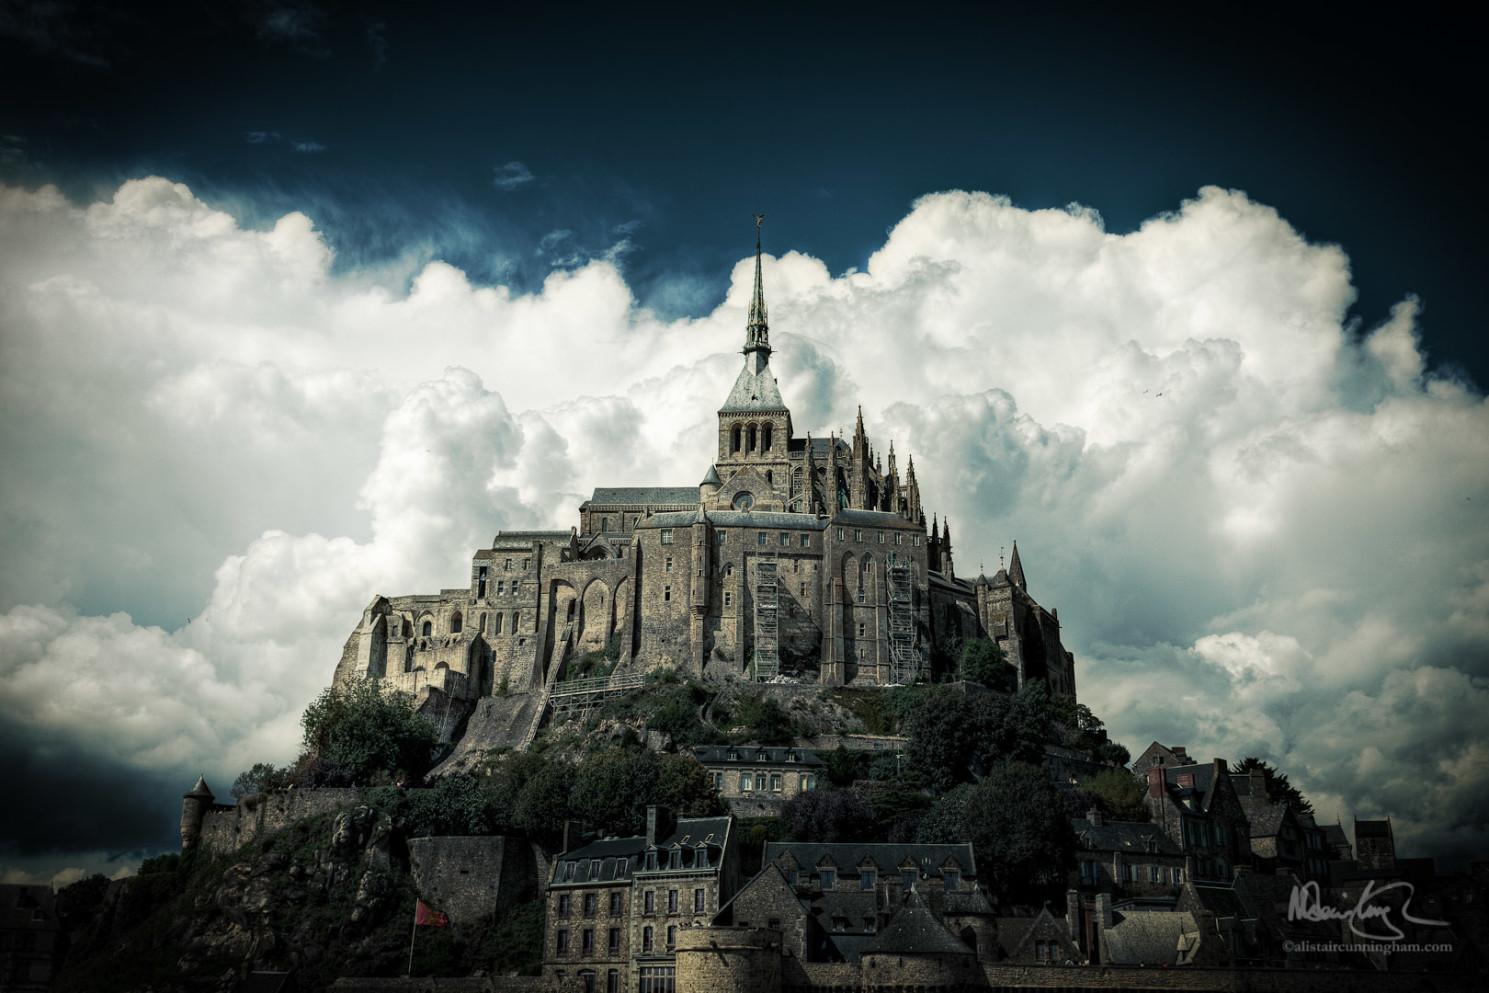 Mont St Michel from the Land Bridge